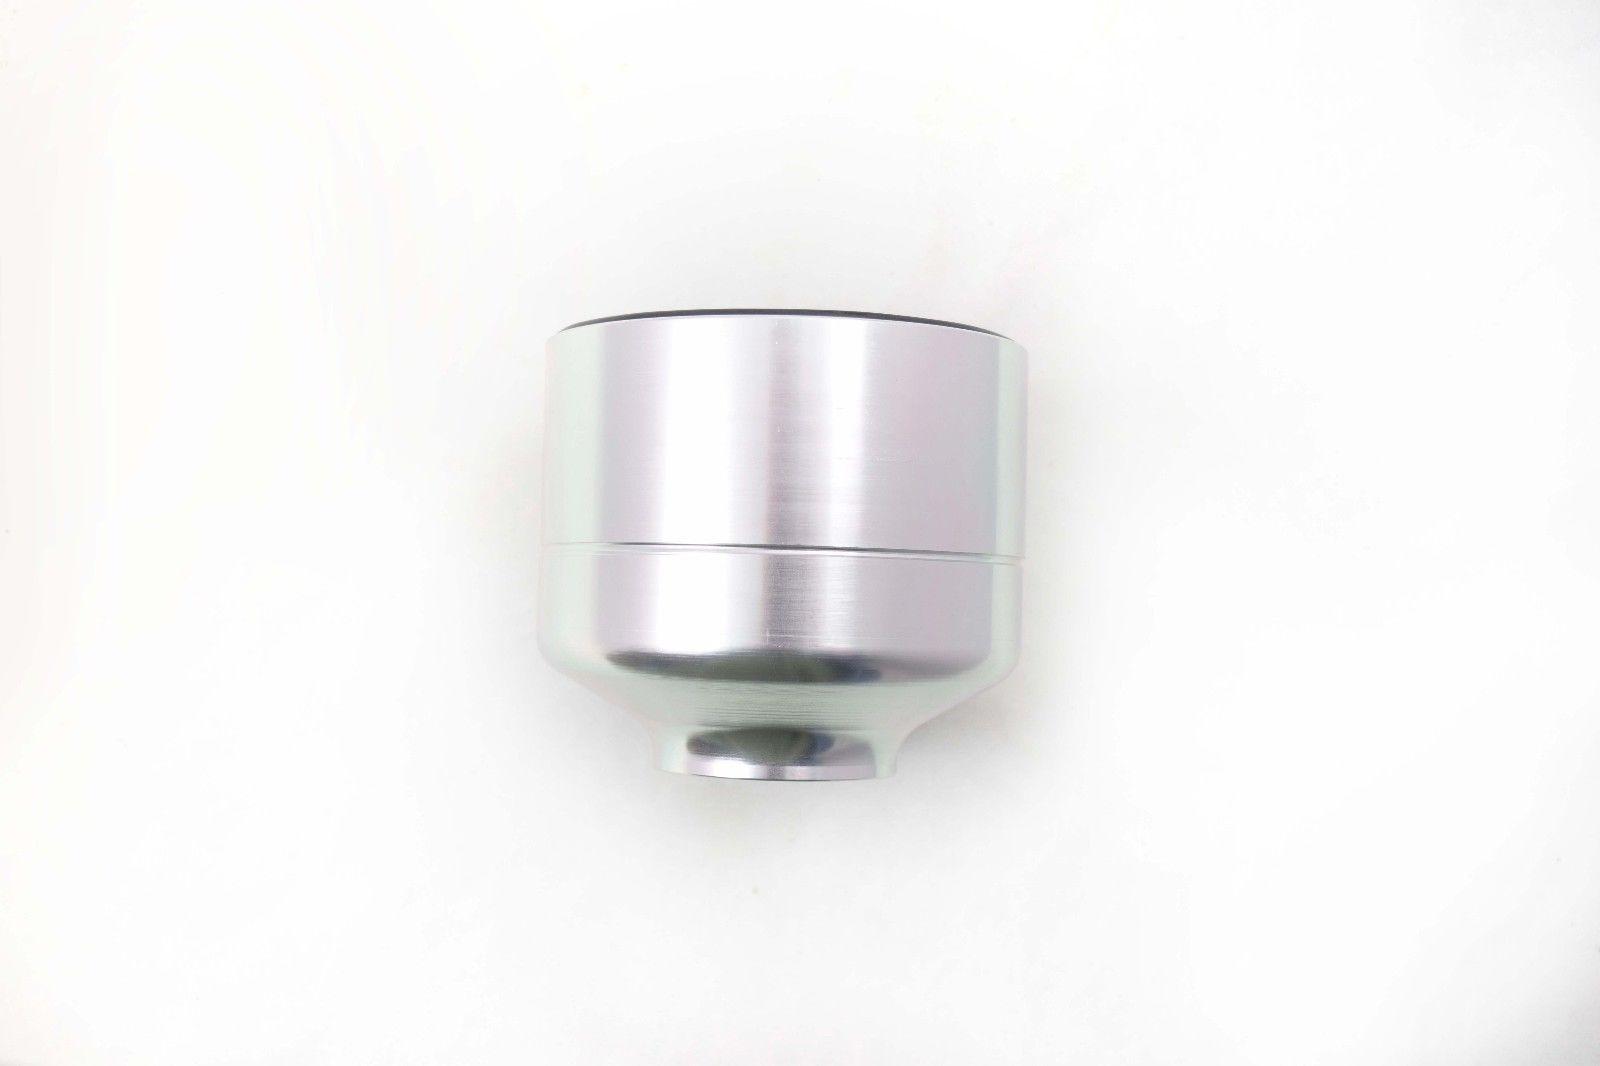 Fuel Filter For 6 Duramax Lbz Upgrades 2007 Housing Delete Kit 2001 2016 Gm 6l Diesel Lb7 Lly 66